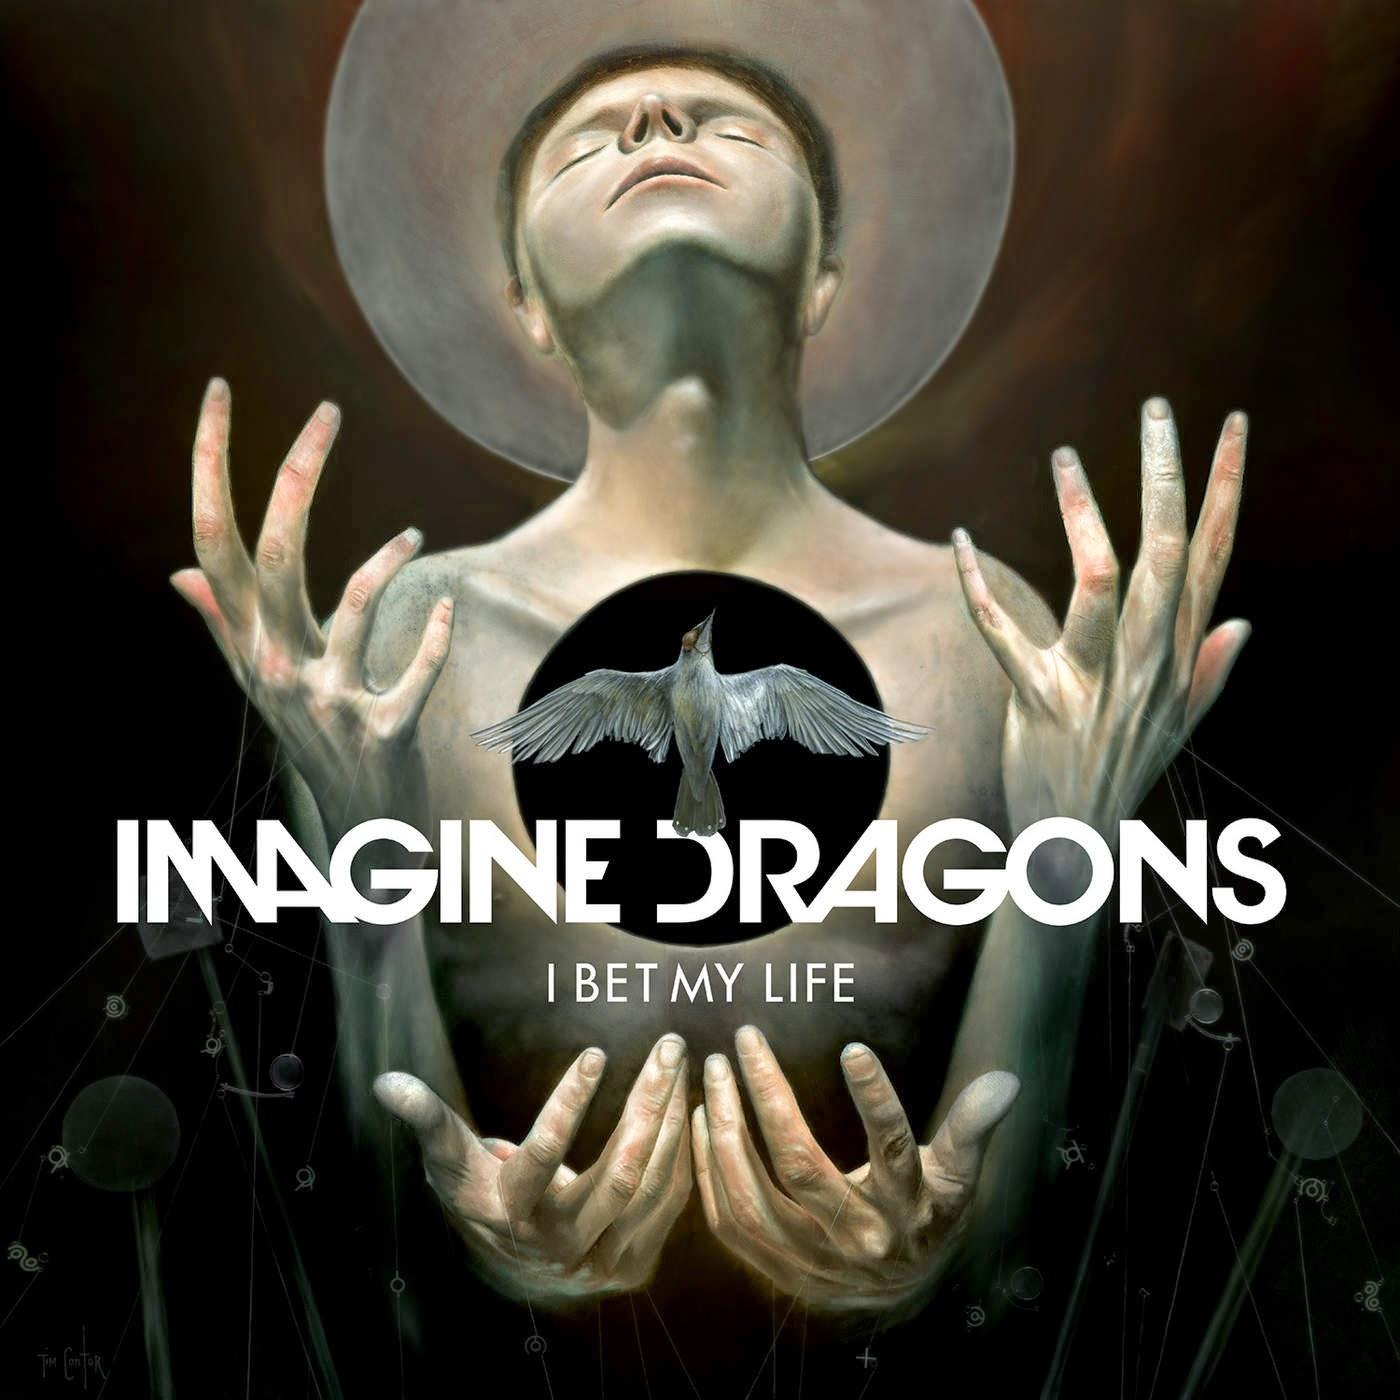 Download Imagine Dragons - I Bet My Life 2014 MP3 Música